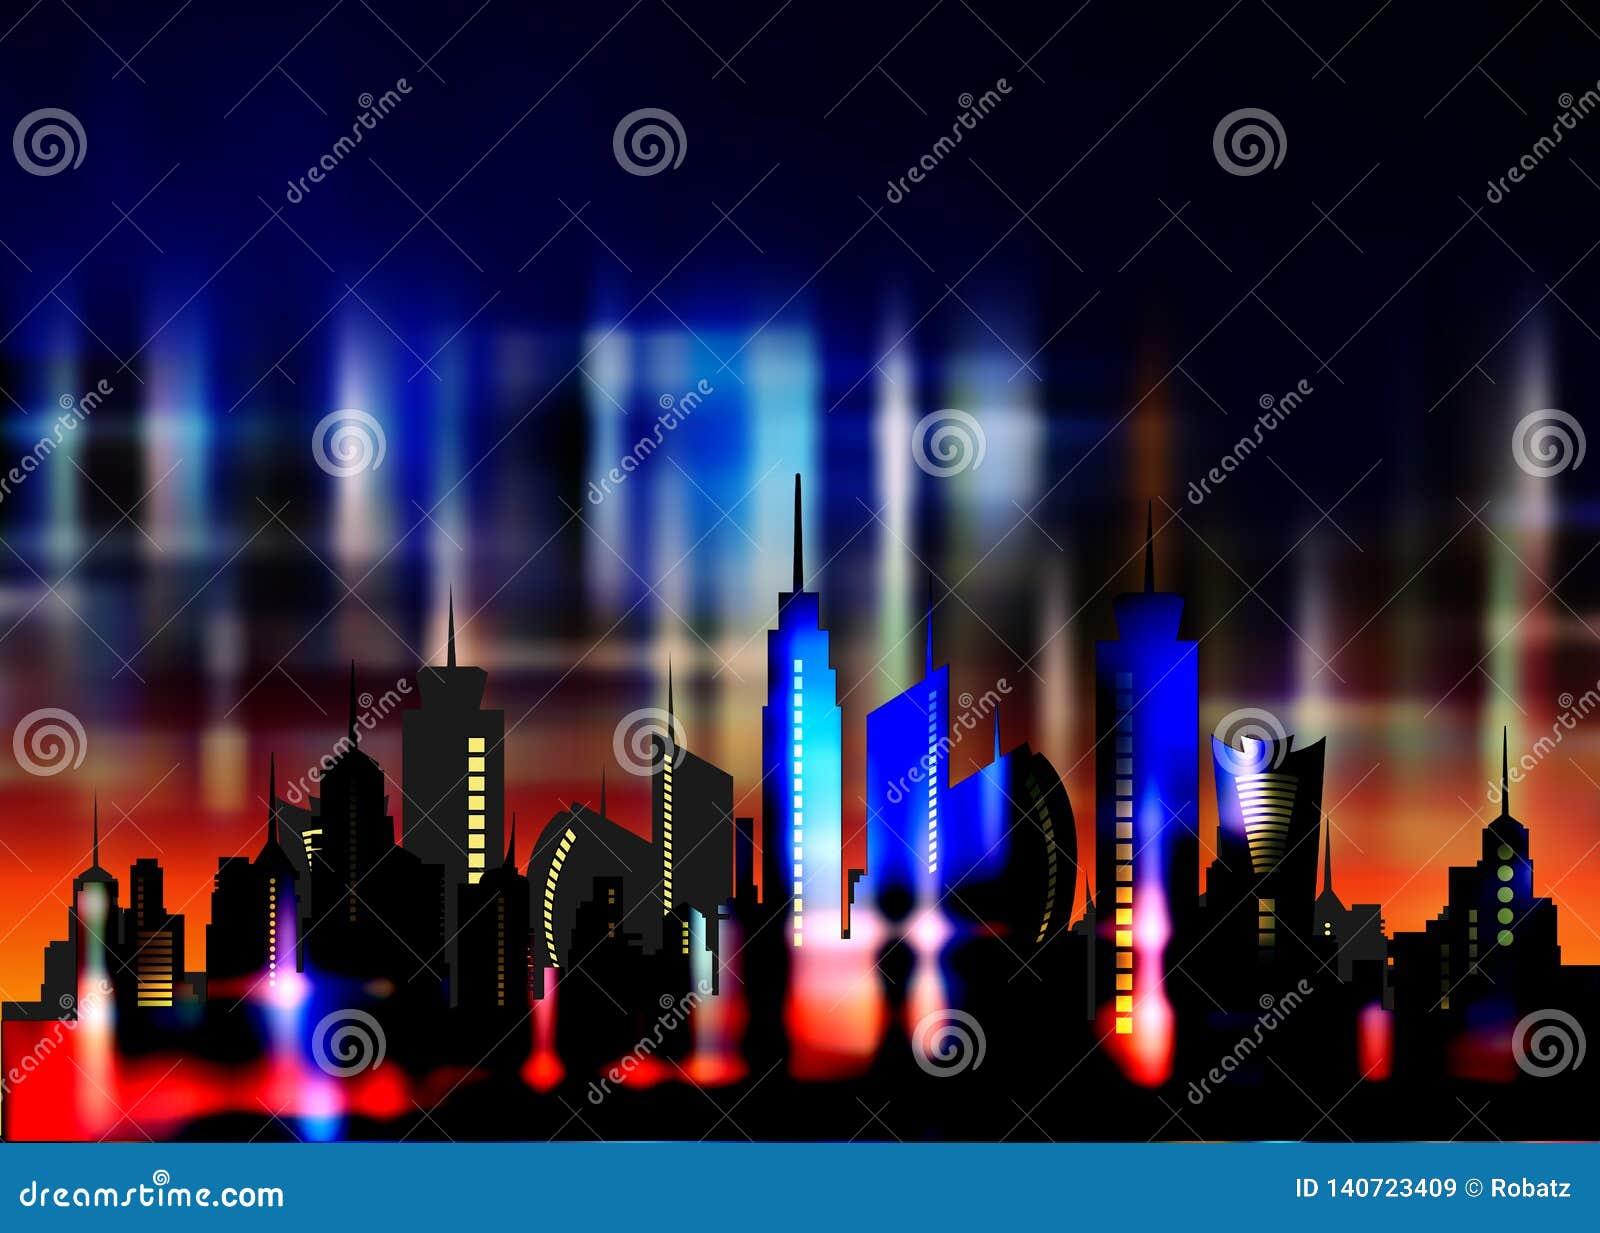 Futuristic city in neon lights. Retro Style 80s. Energy concept. Creative idea. Design background, colorful Night City Skyline